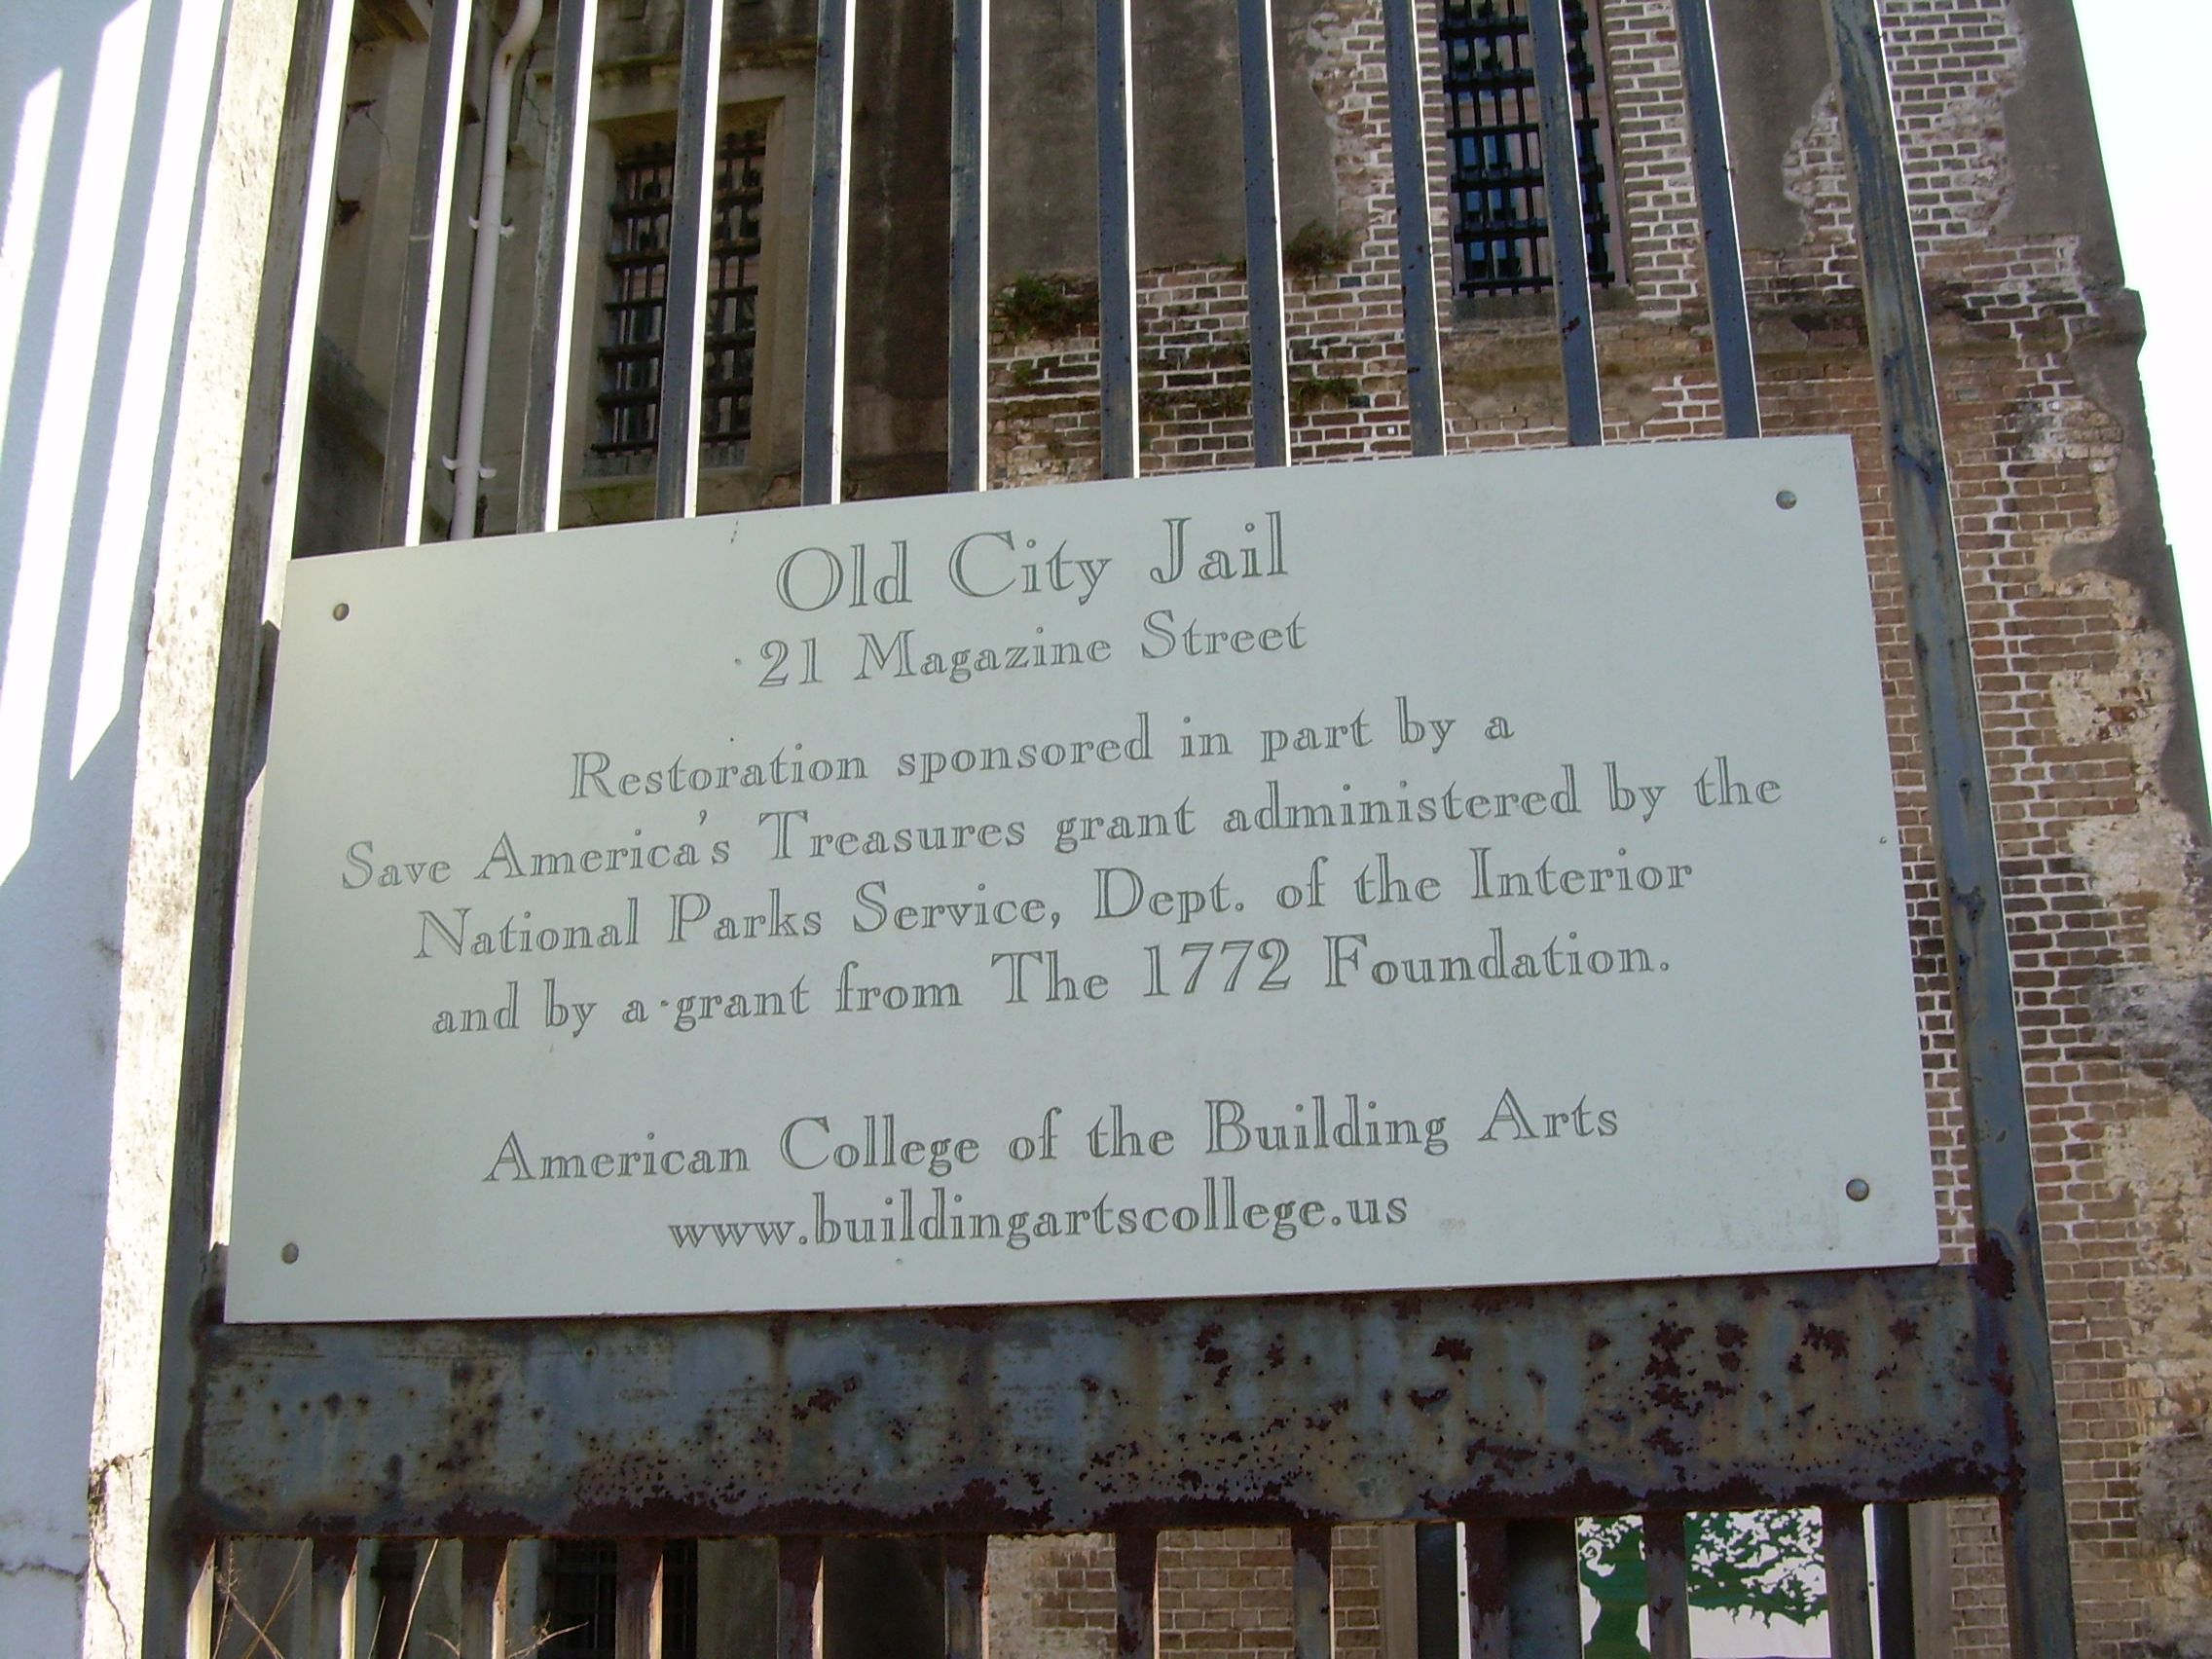 Historic marker old charleston jail jail american